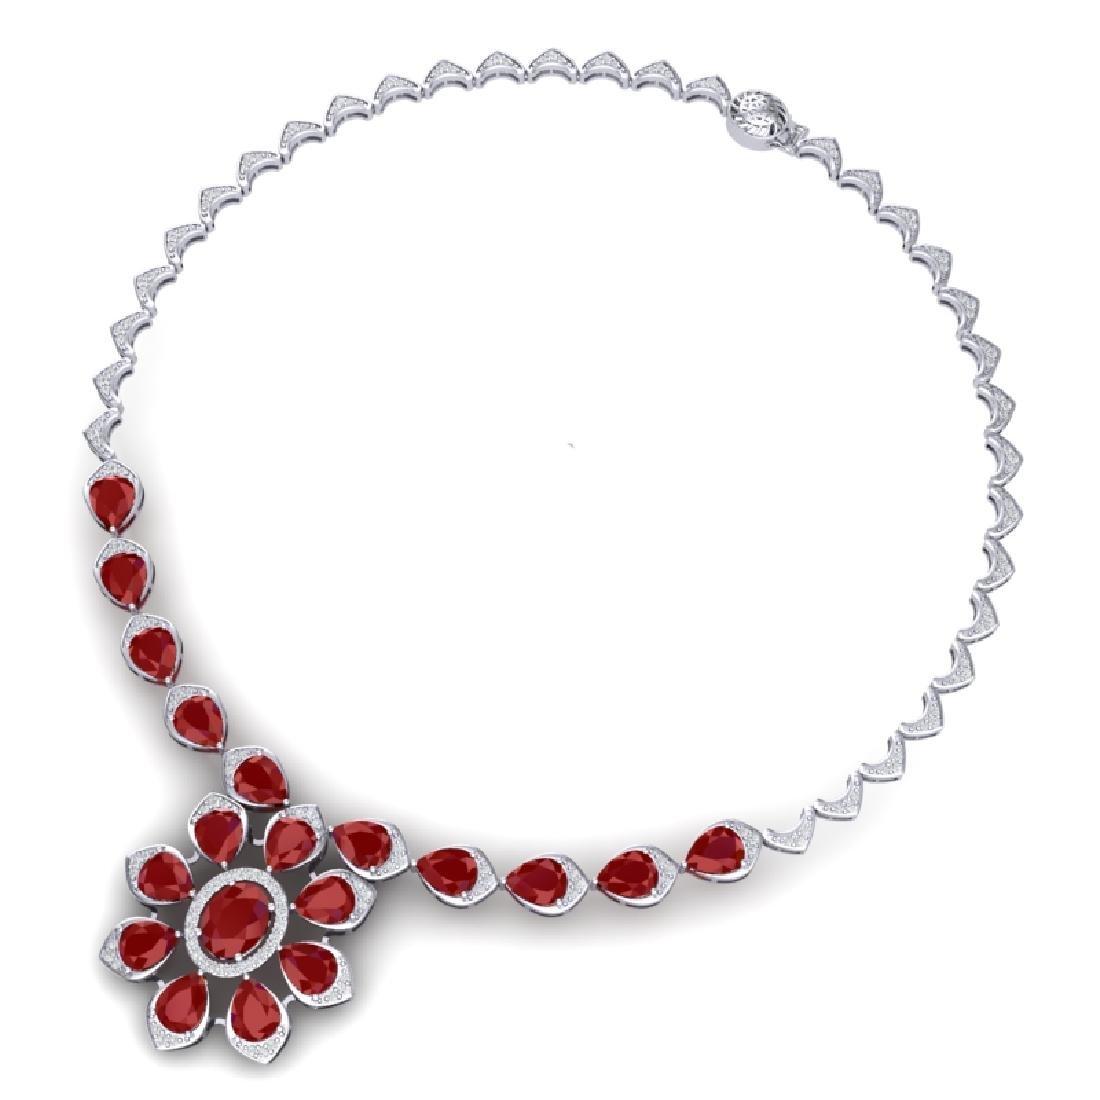 30.70 CTW Royalty Ruby & VS Diamond Necklace 18K White - 3